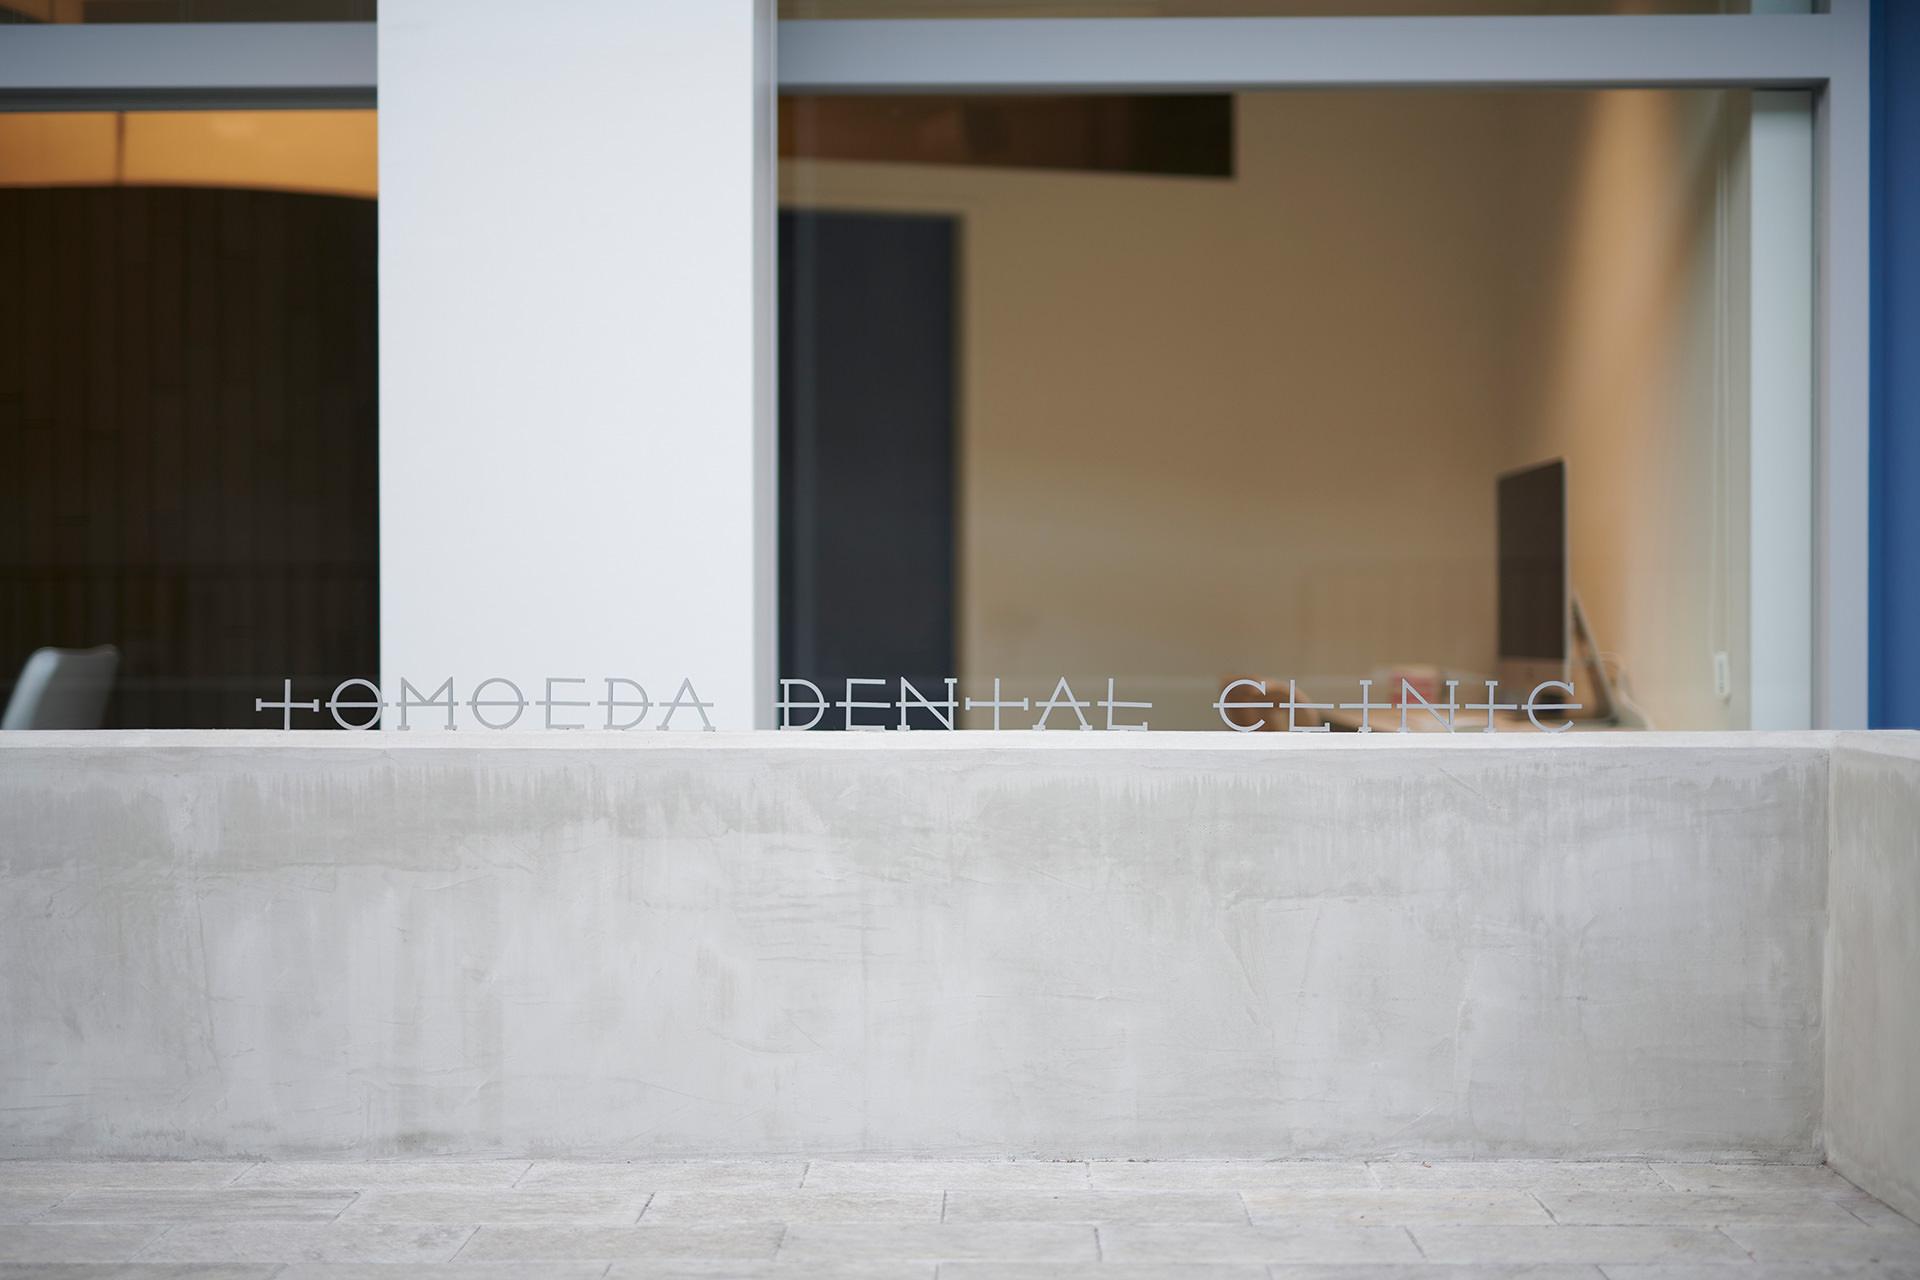 TOMOEDA DENTAL CLINIC